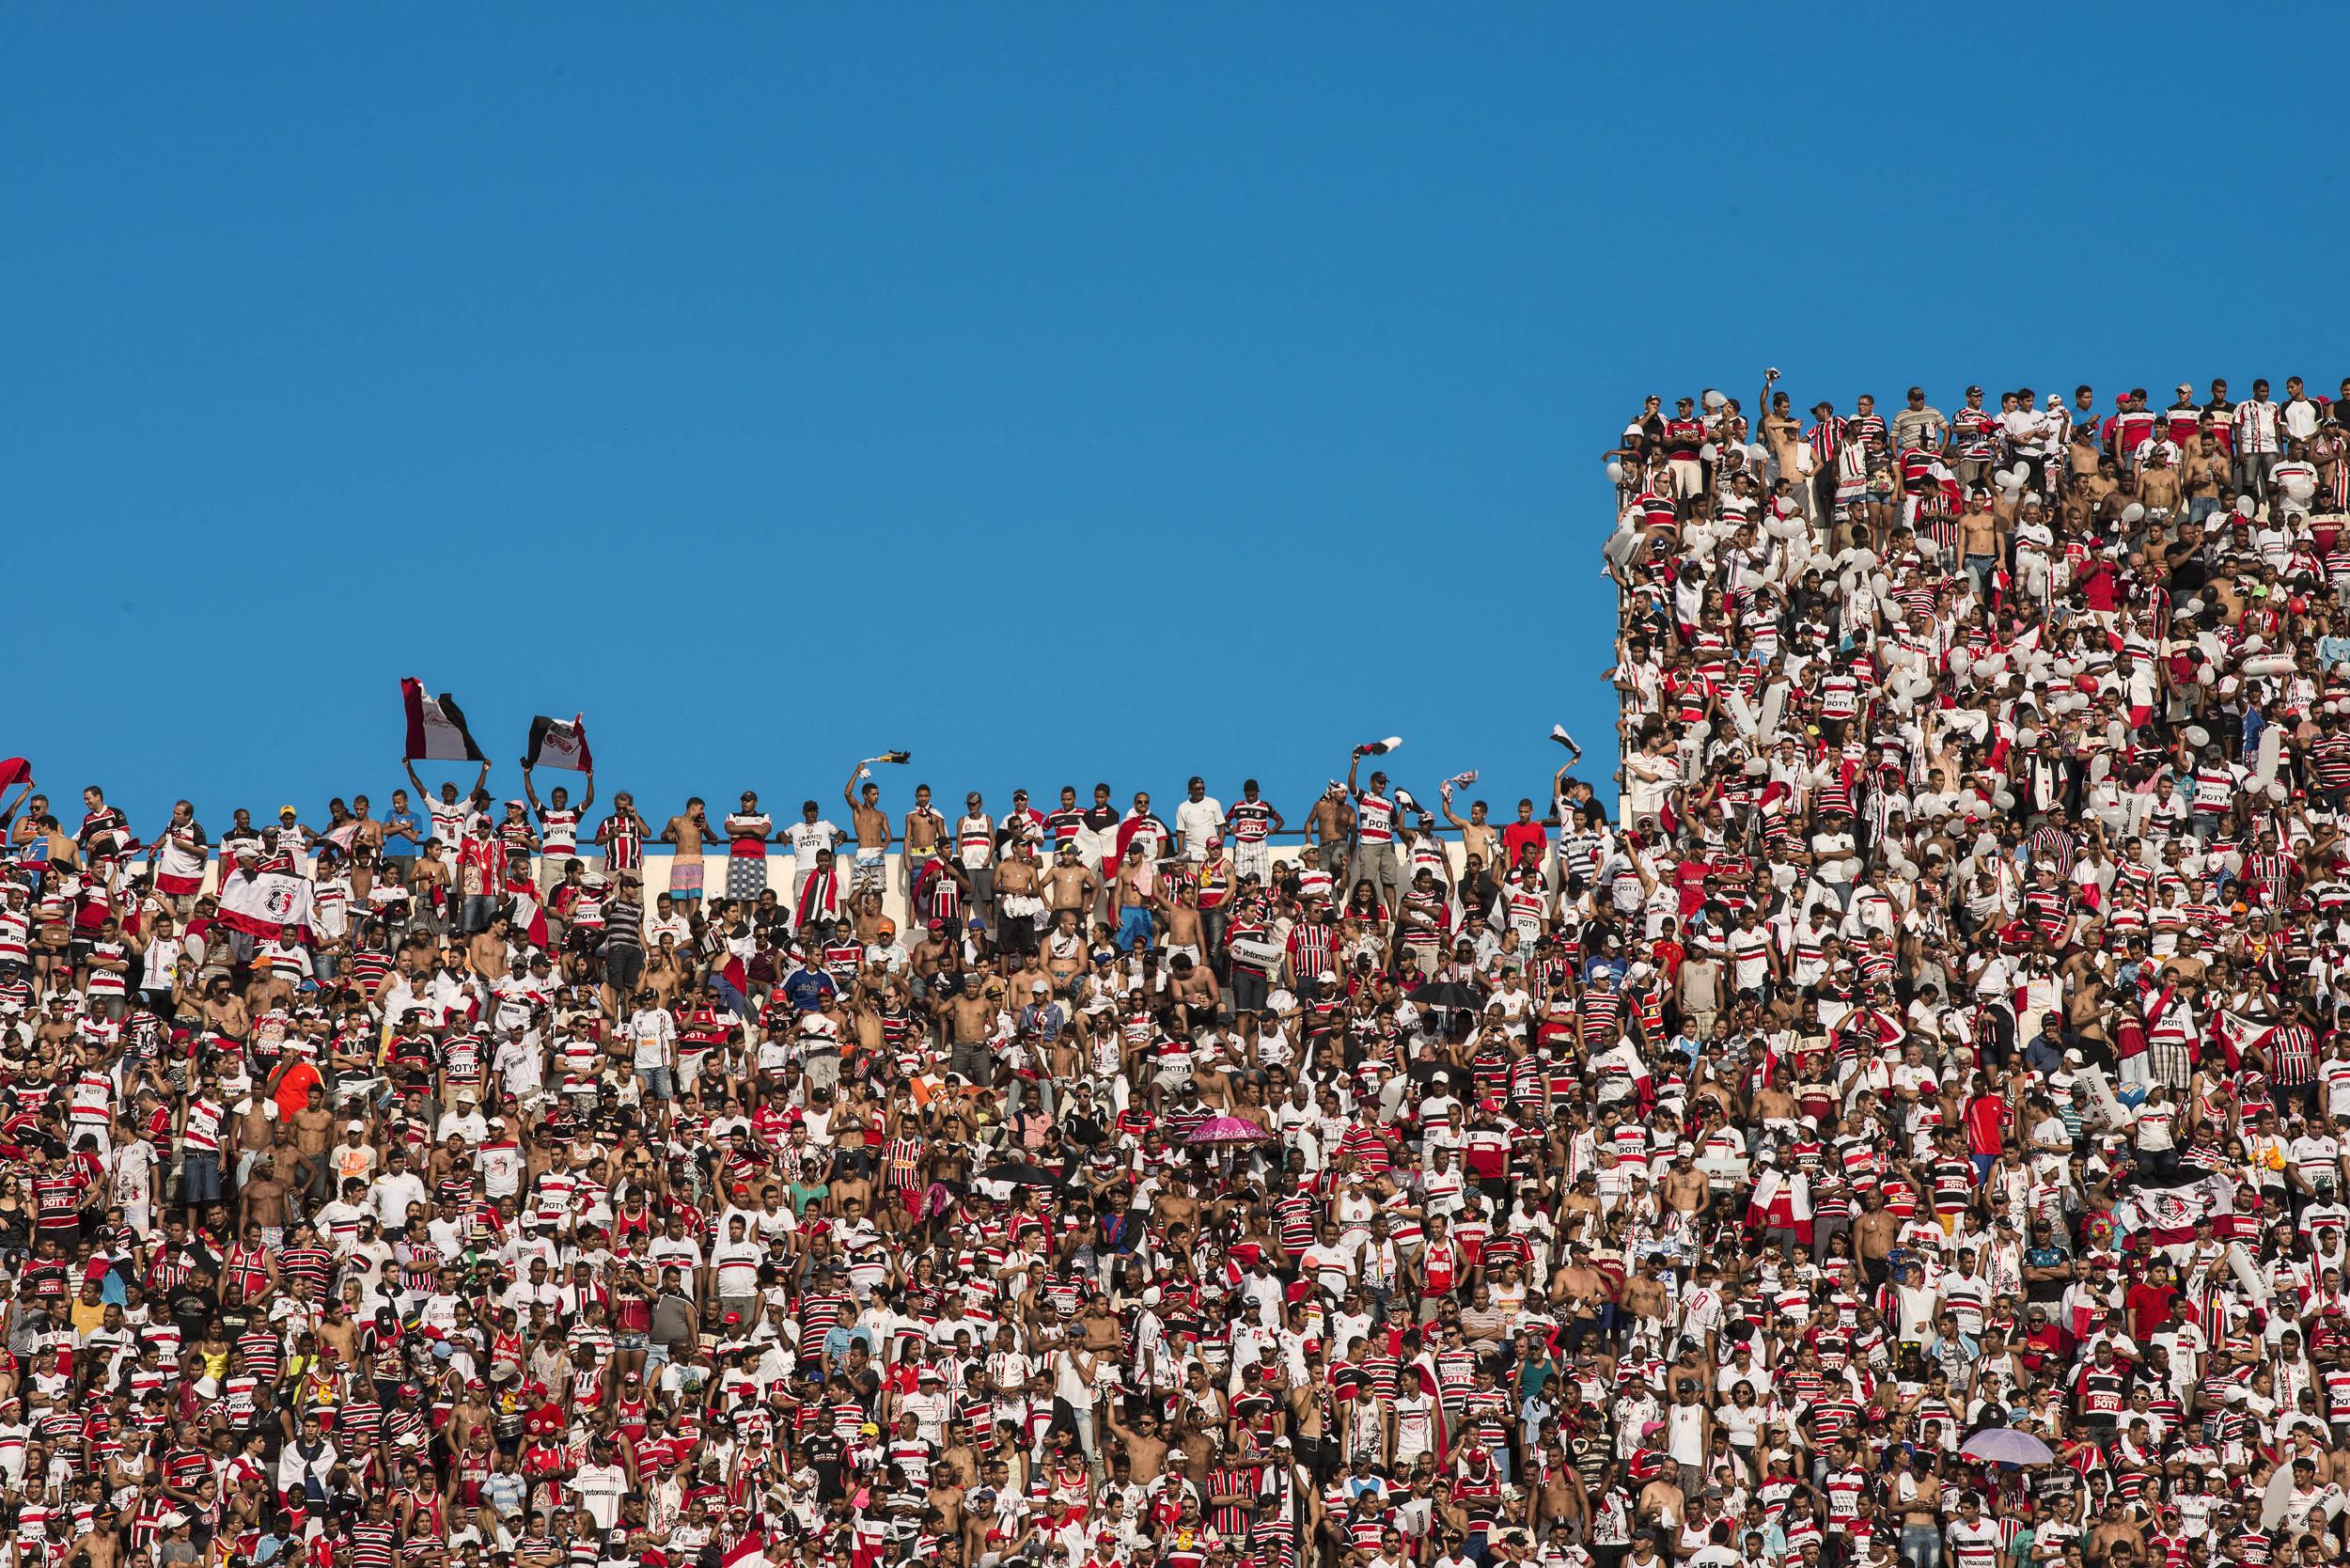 03112013_JLB_Futebol_032.jpg